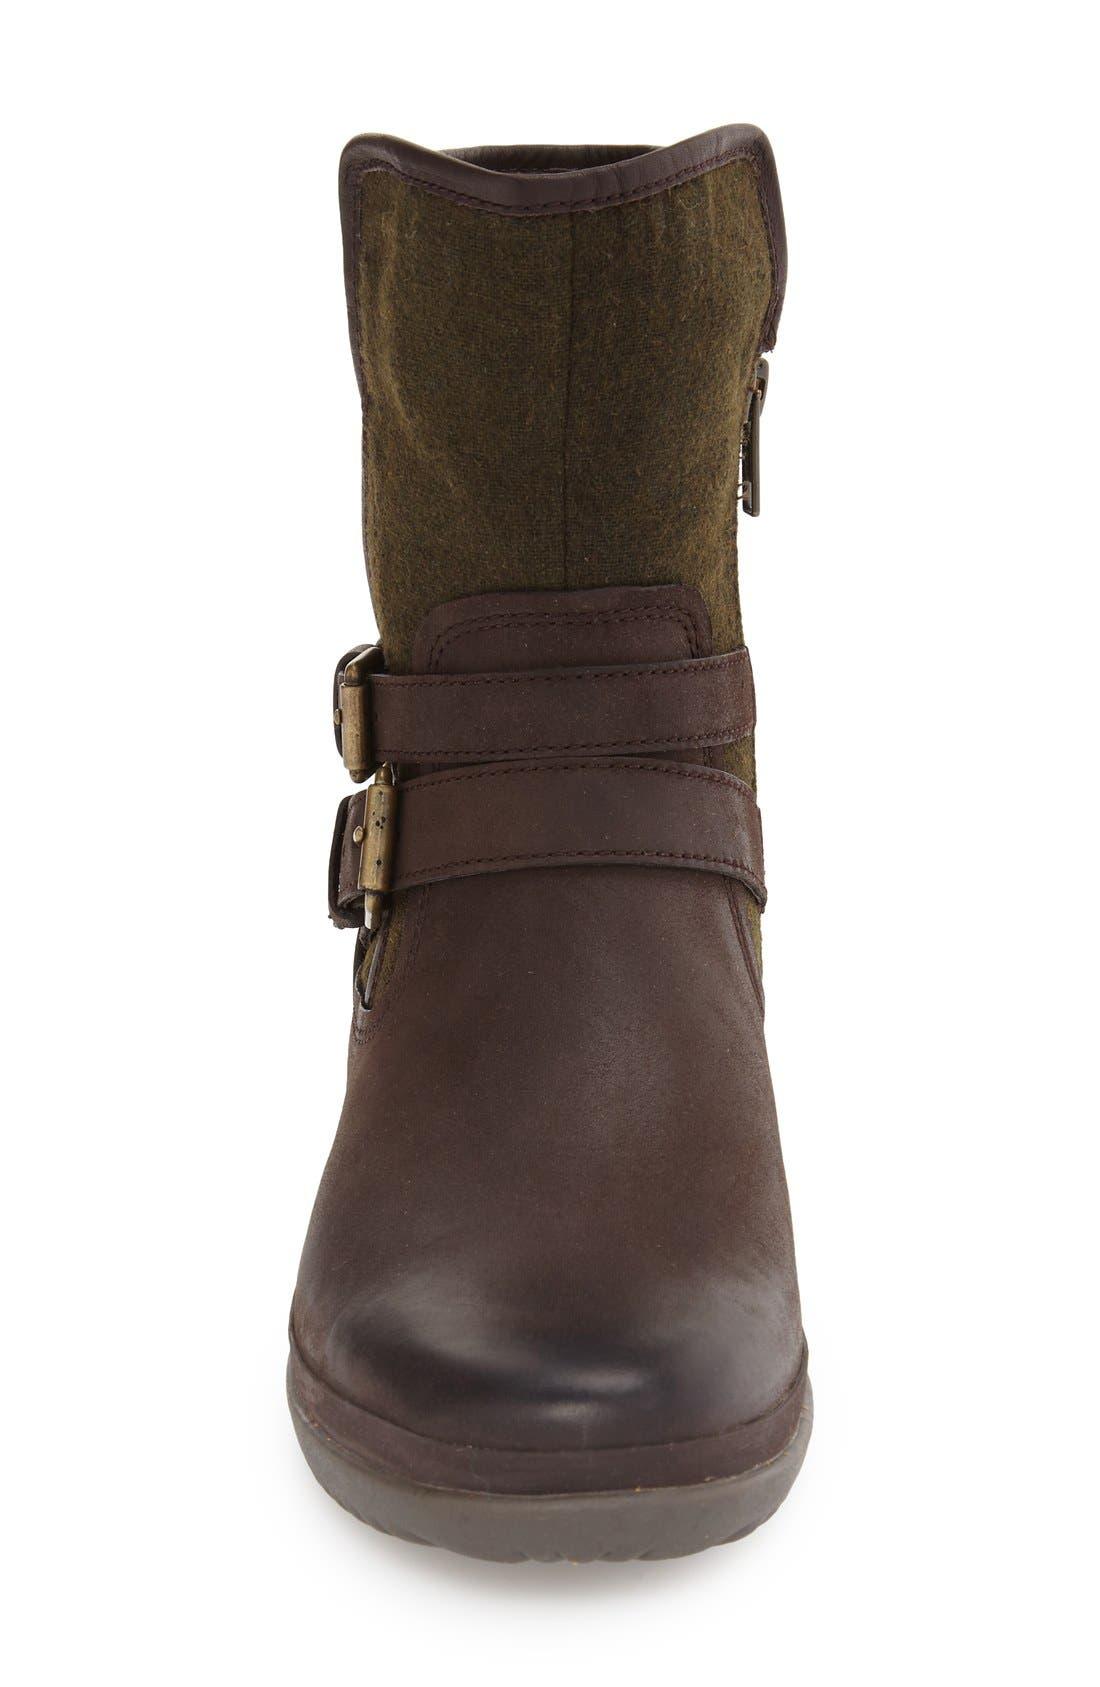 Alternate Image 3  - UGG® Simmens Waterproof Leather Boot (Women)